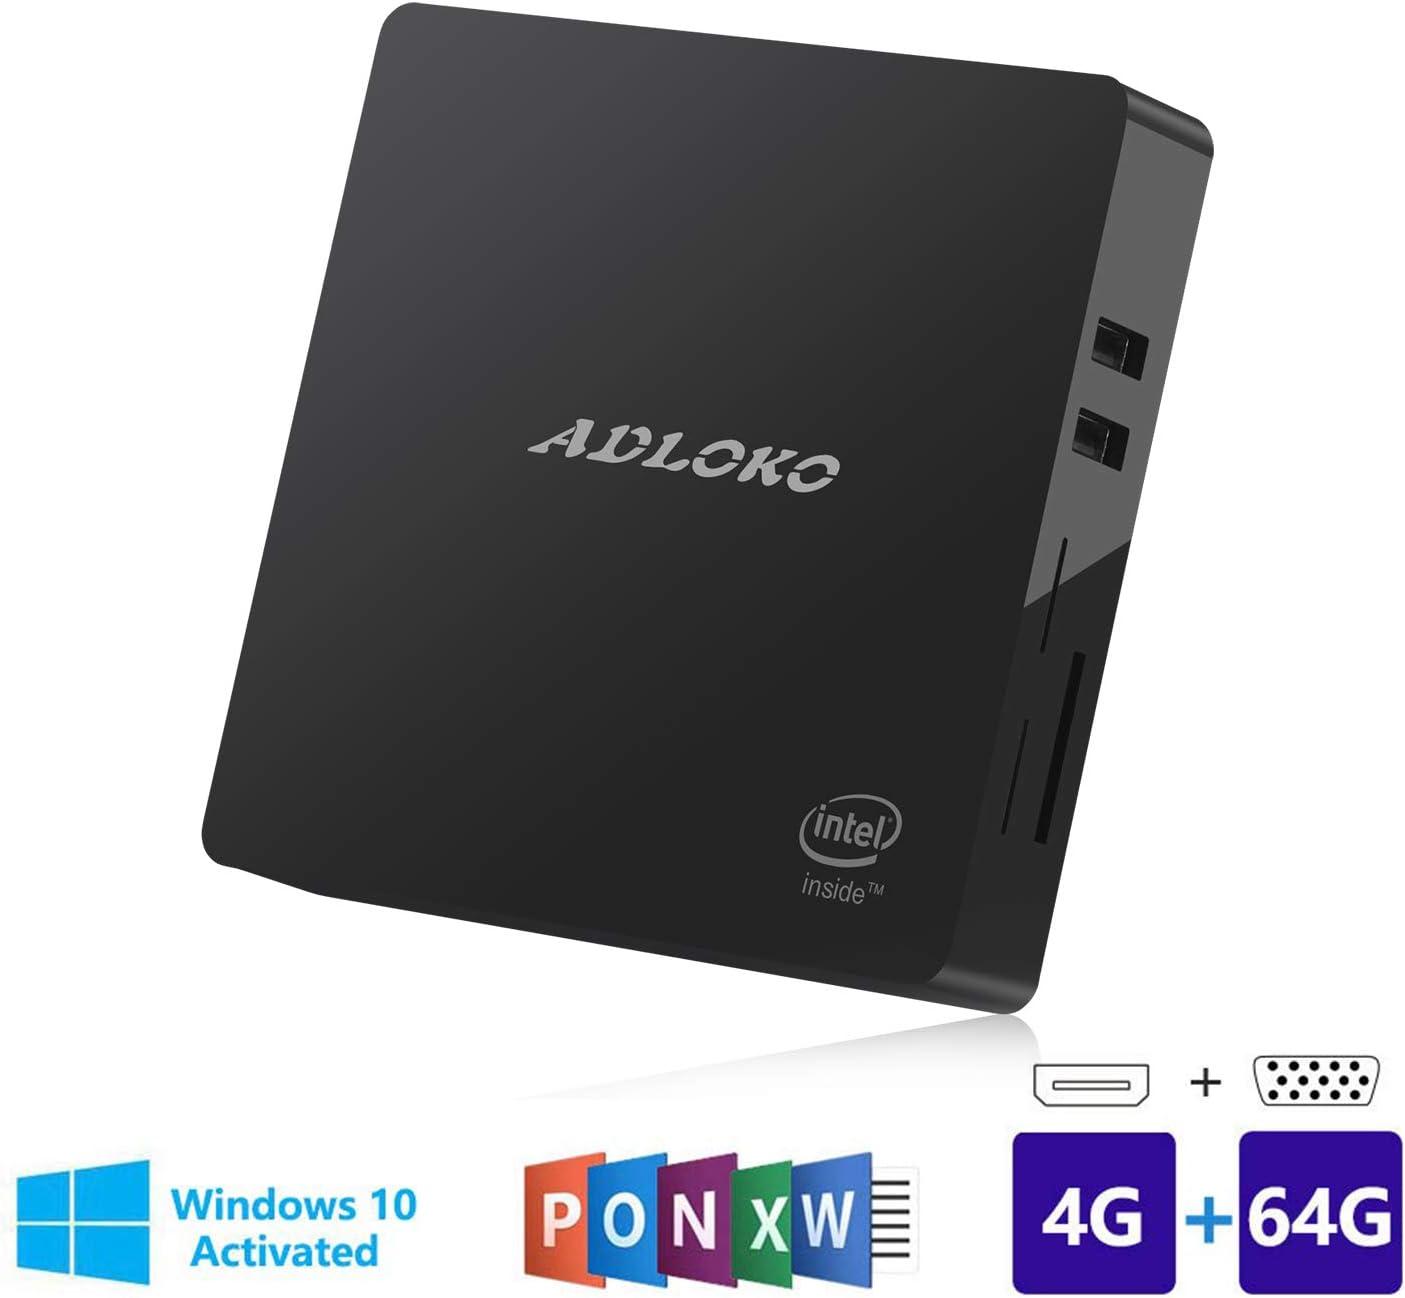 Mini PC, 4 GB/64 GB Windows 10 64 bits Intel Atom Z8350 (hasta 1.92 GHz), 4 K/HDMI/VGA/USB 3.0/Gigabit Ethernet/Dual WiFi/SD Card Reader/BT 4.0, ordenador de sobremesa: Amazon.es: Informática